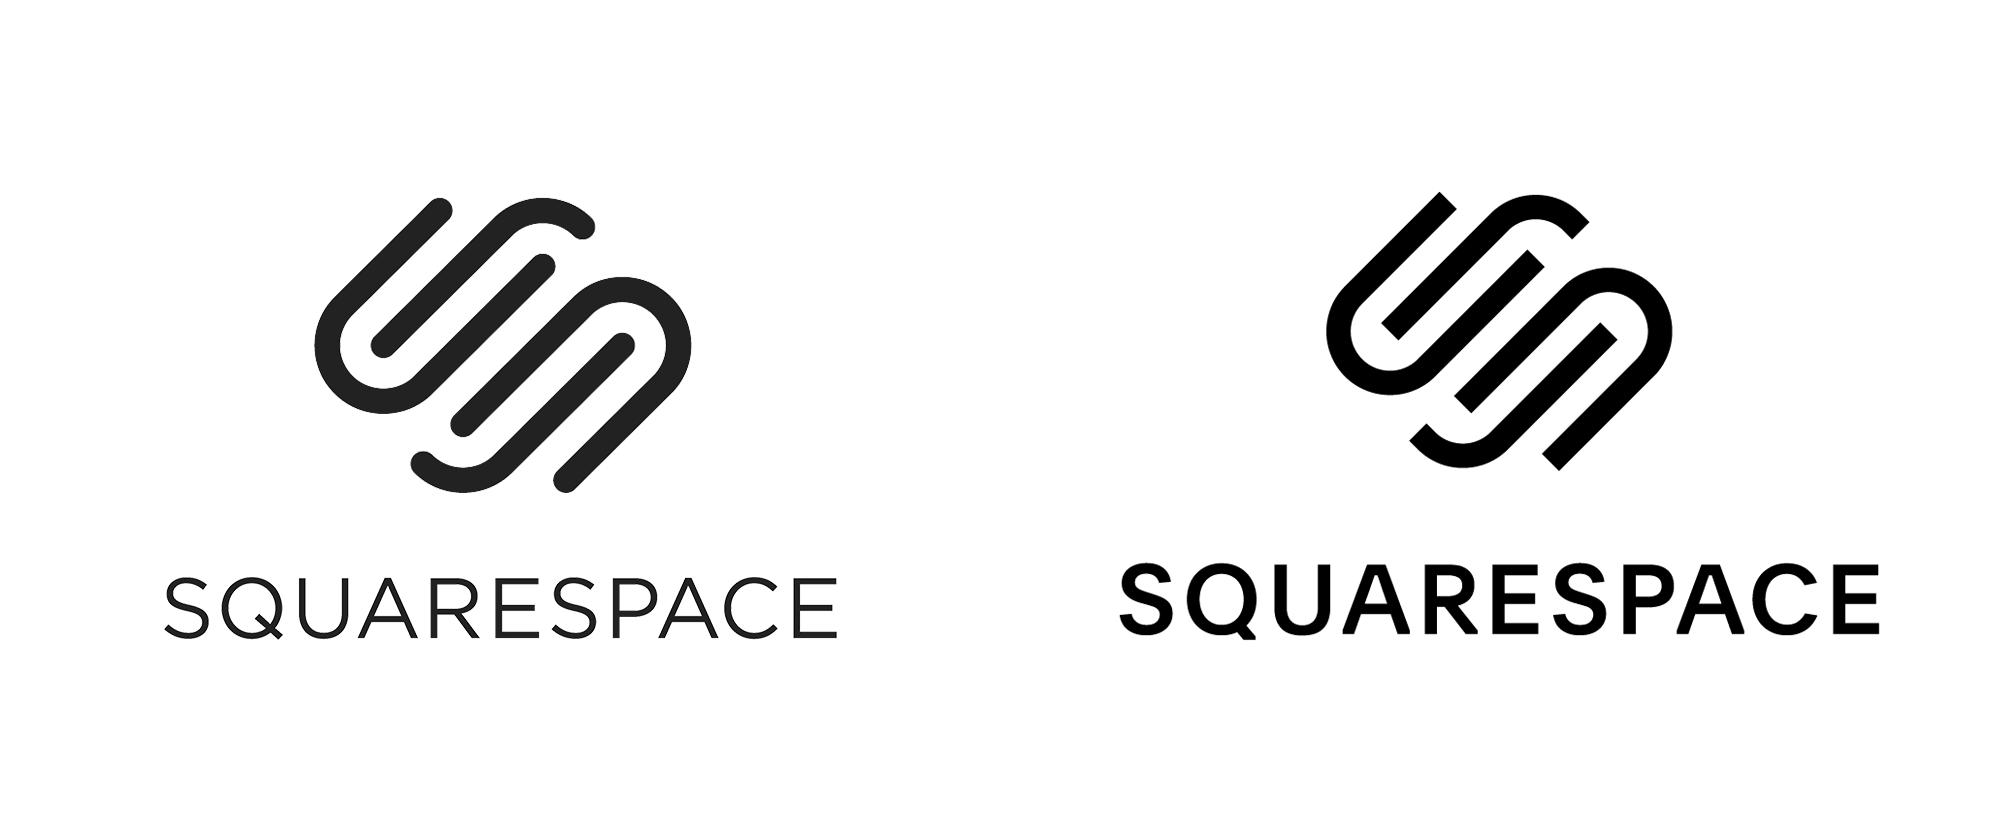 New Logo And Identity For Squarespace By Dia Identity Logo Logos Logo Branding